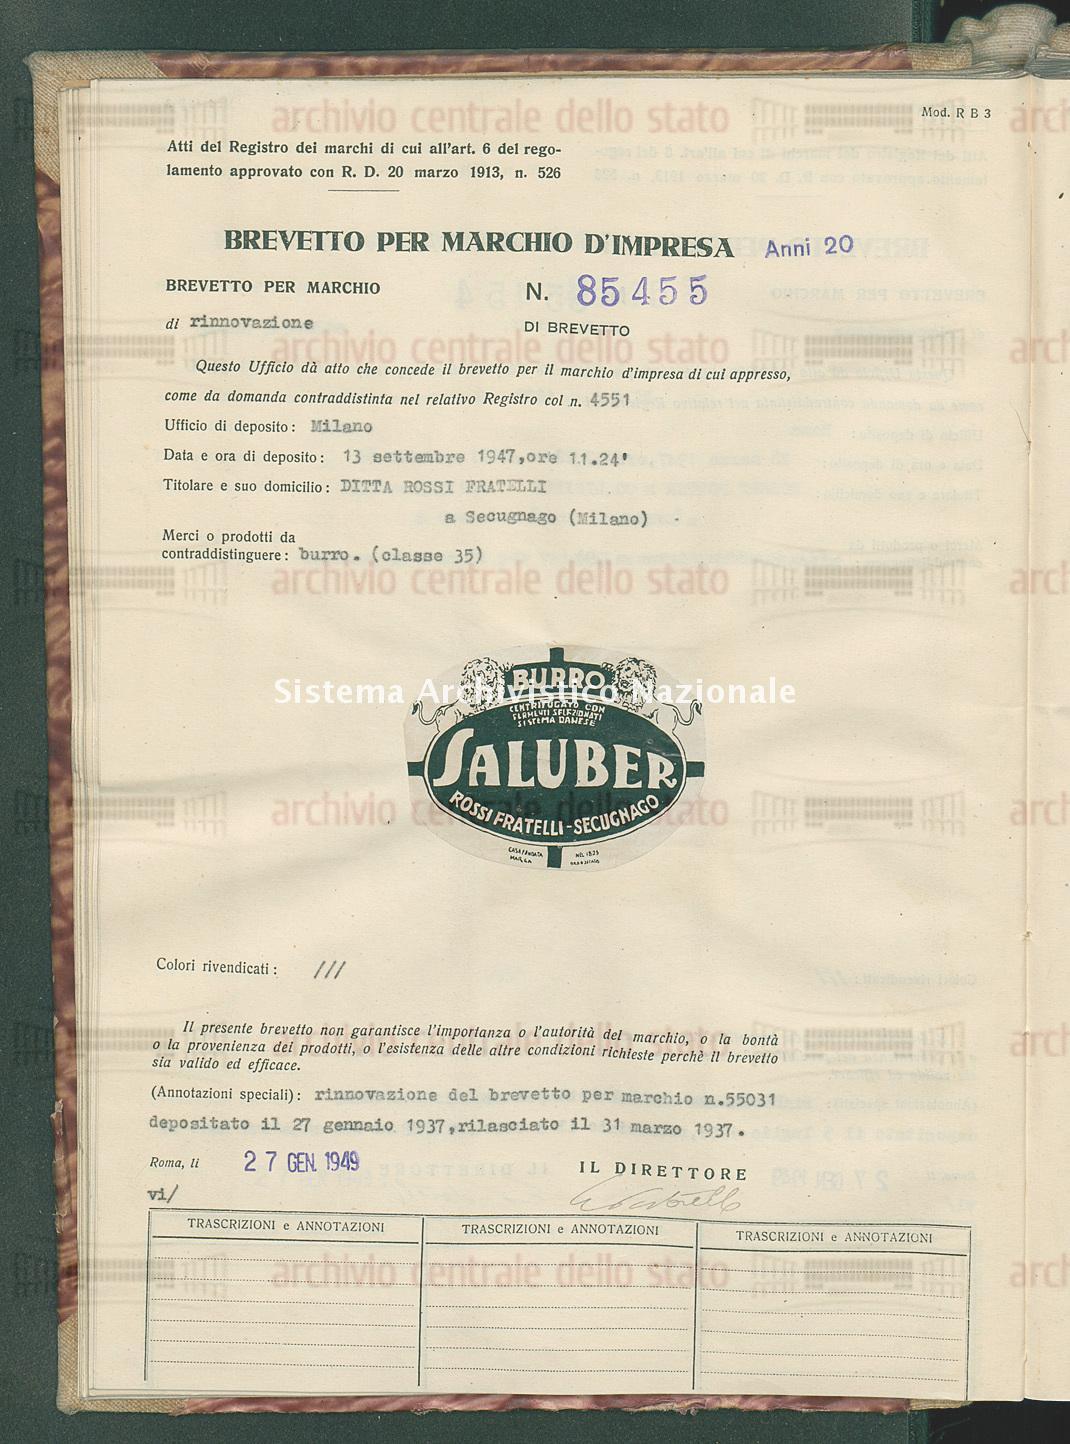 Burro Ditta Rossi Fratelli (27/01/1949)